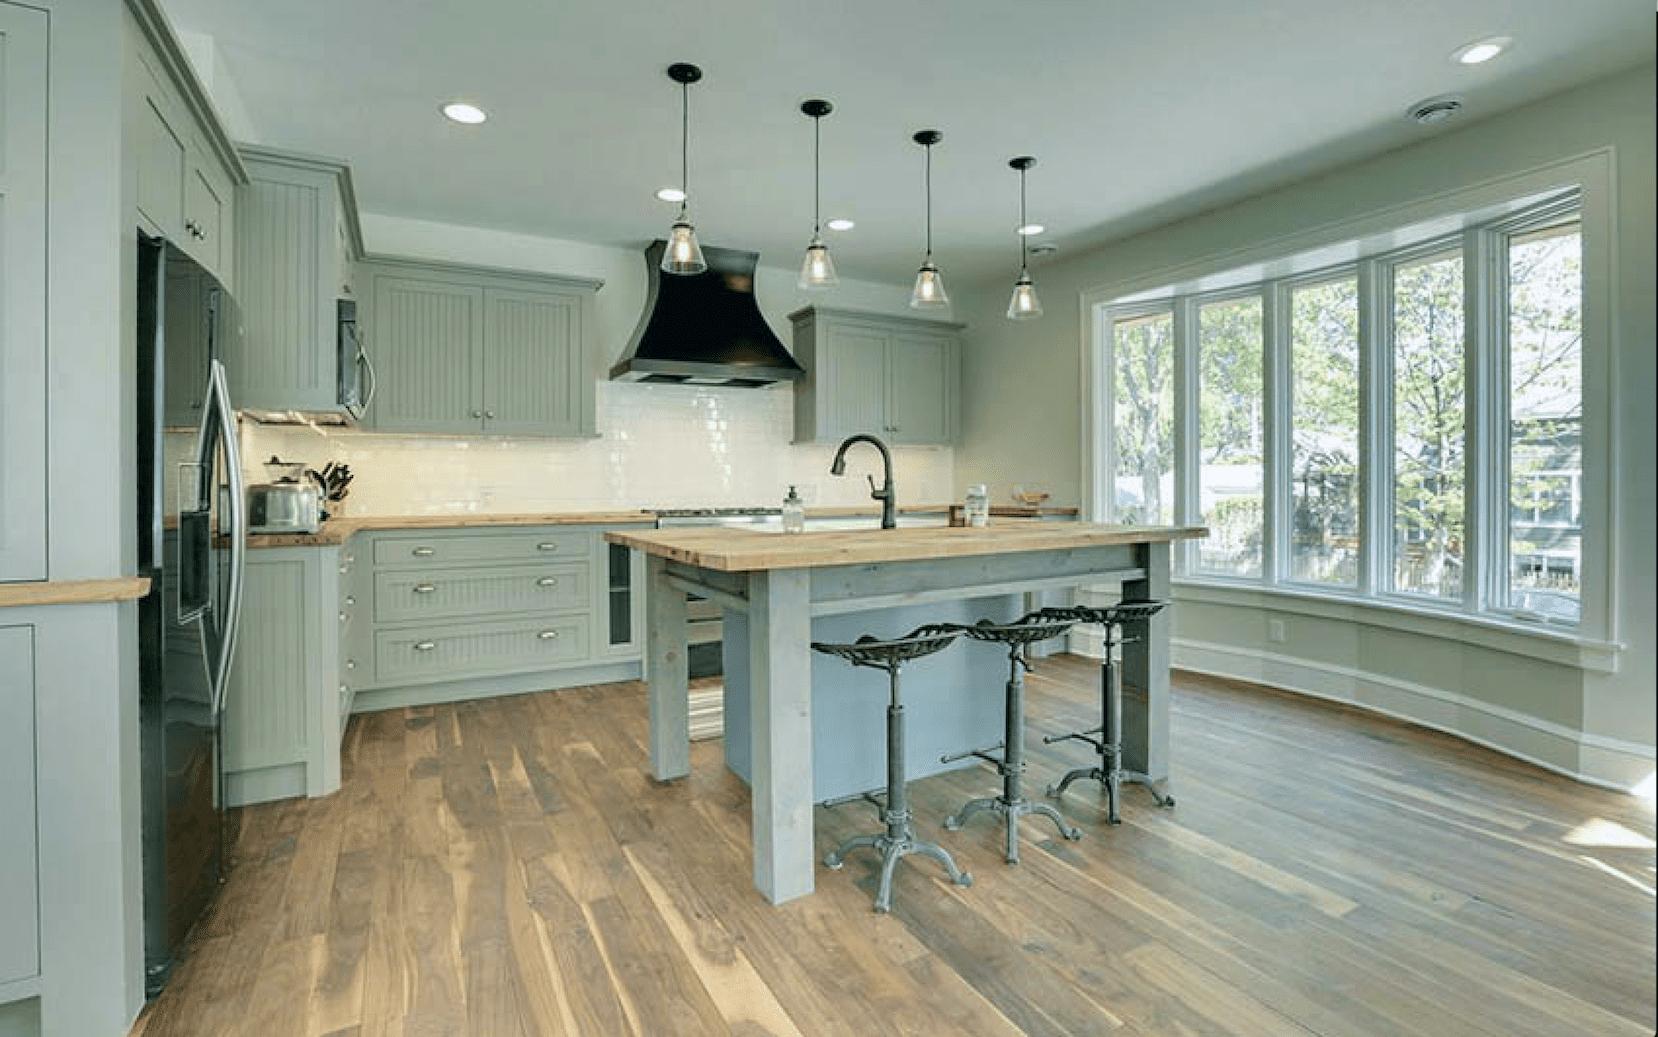 sage kitchen with butcher block countertops